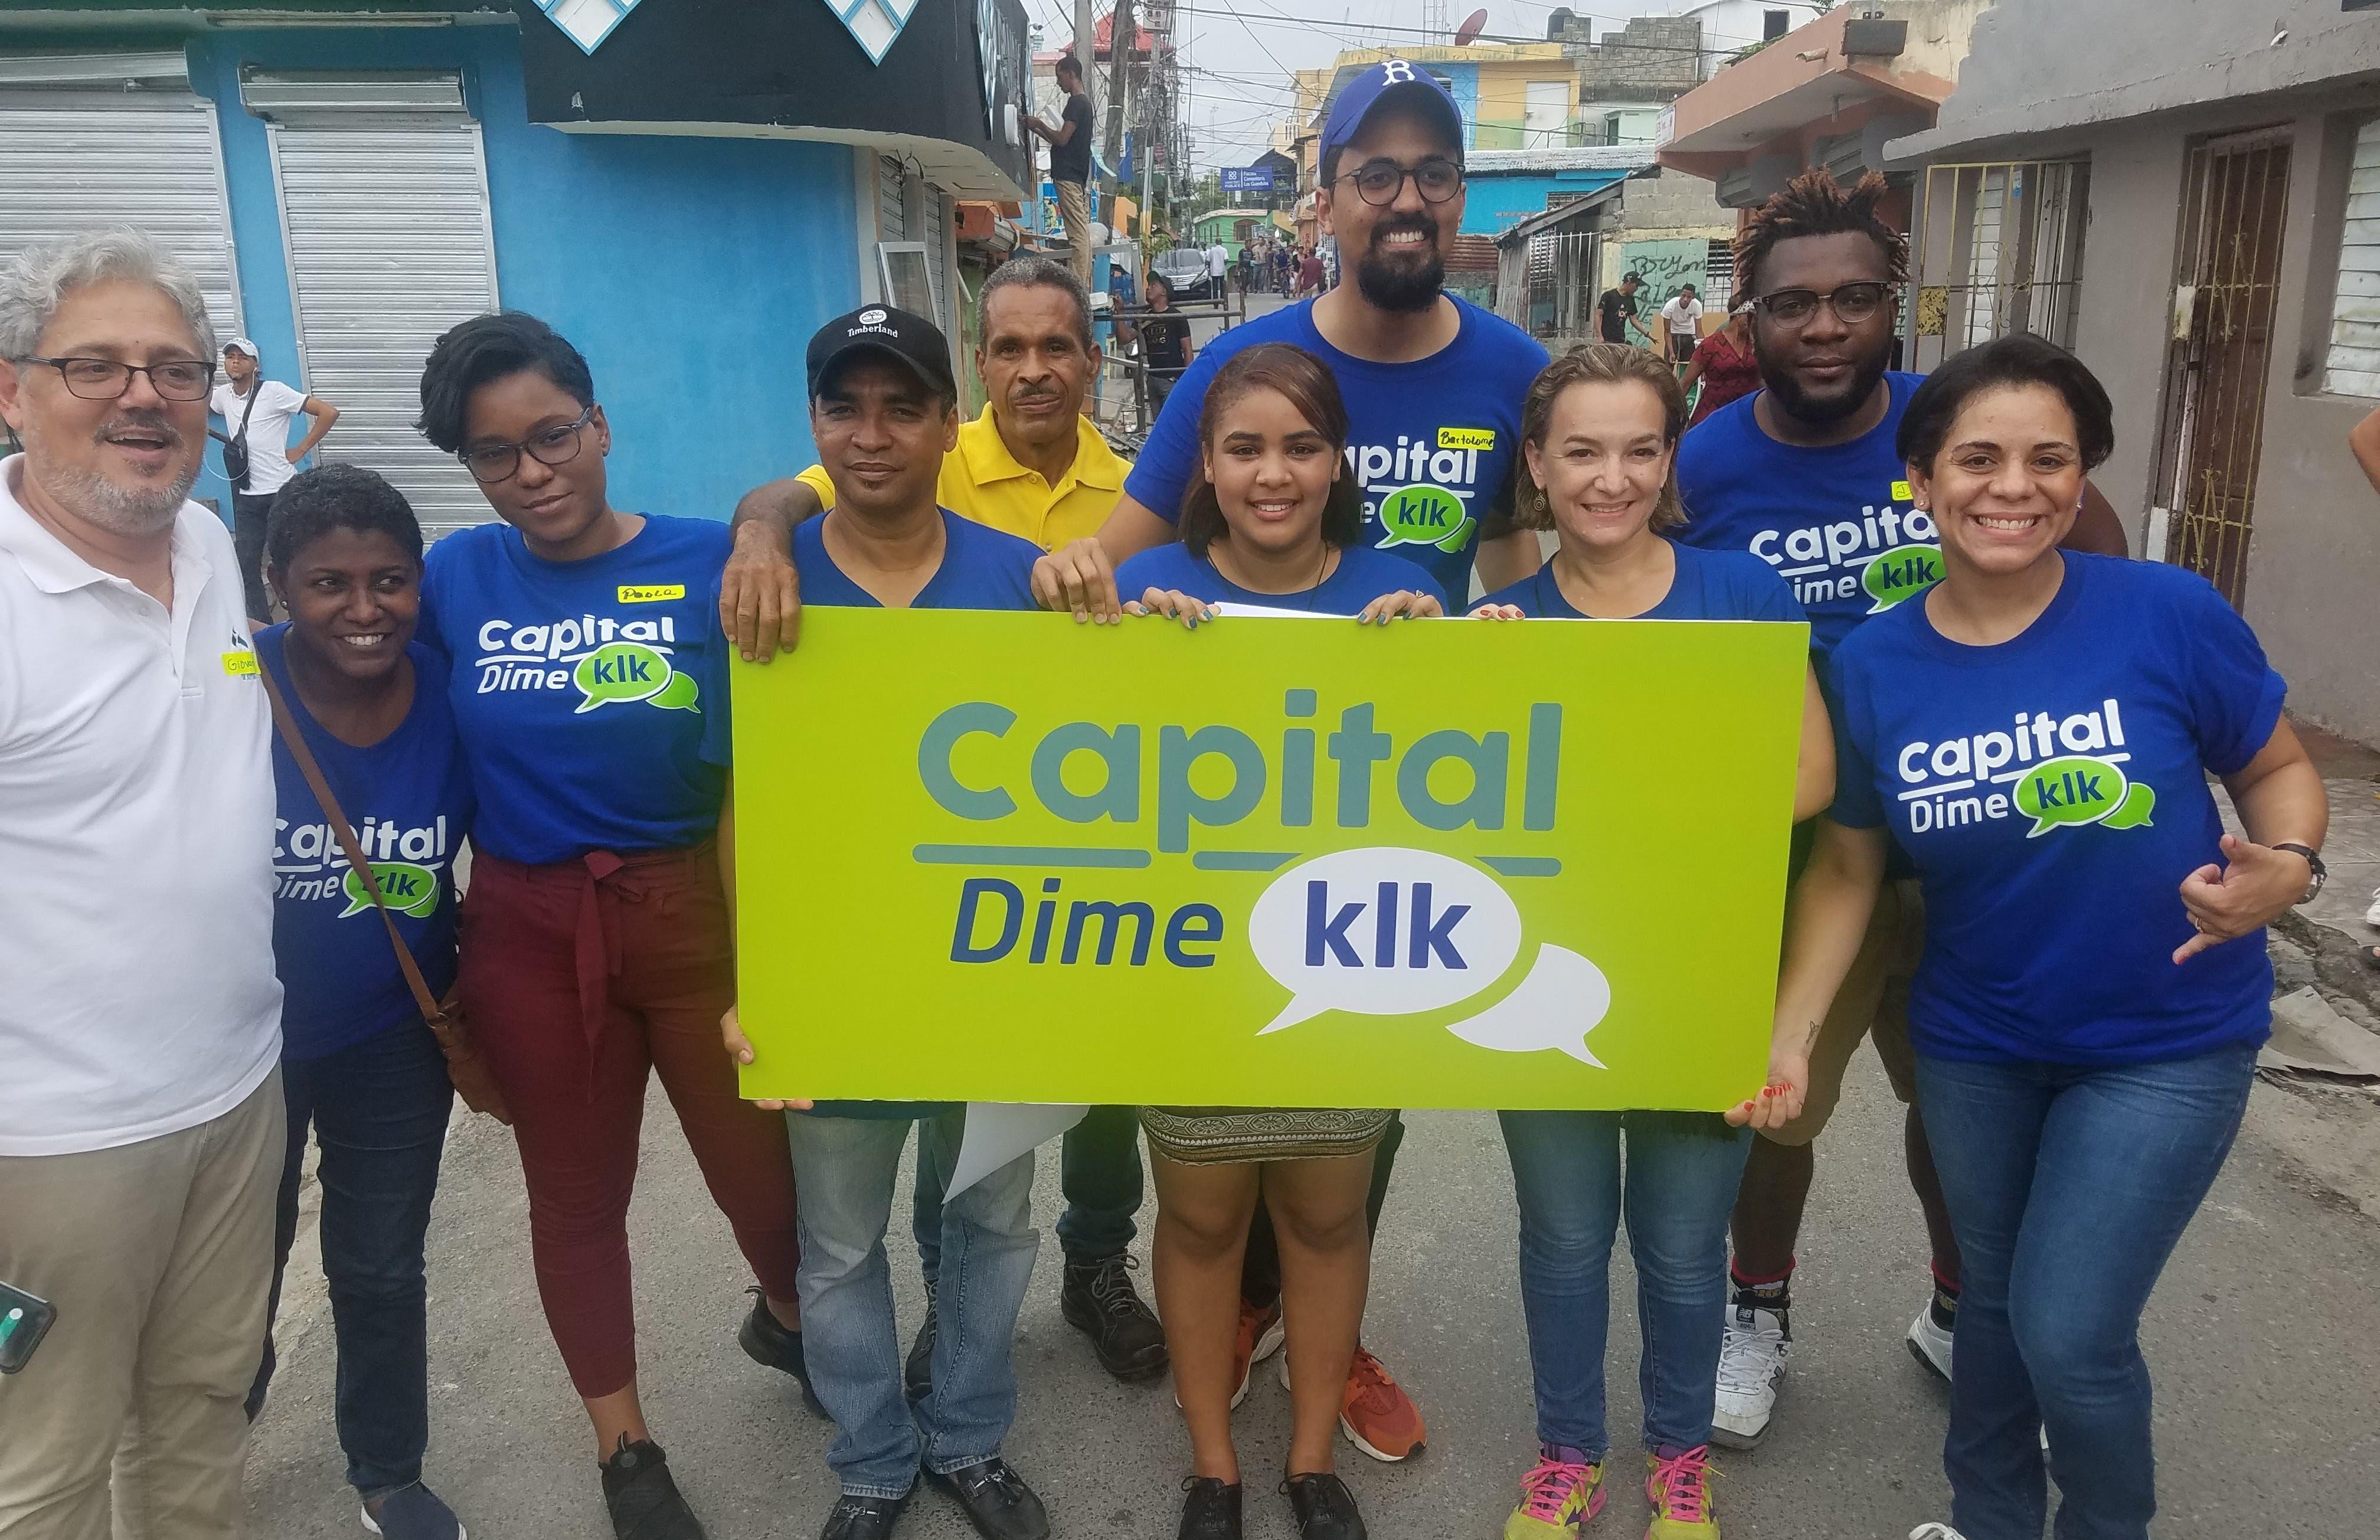 "El aspirante a alcalde lanza consulta ciudadana ""Capital dime klk"""